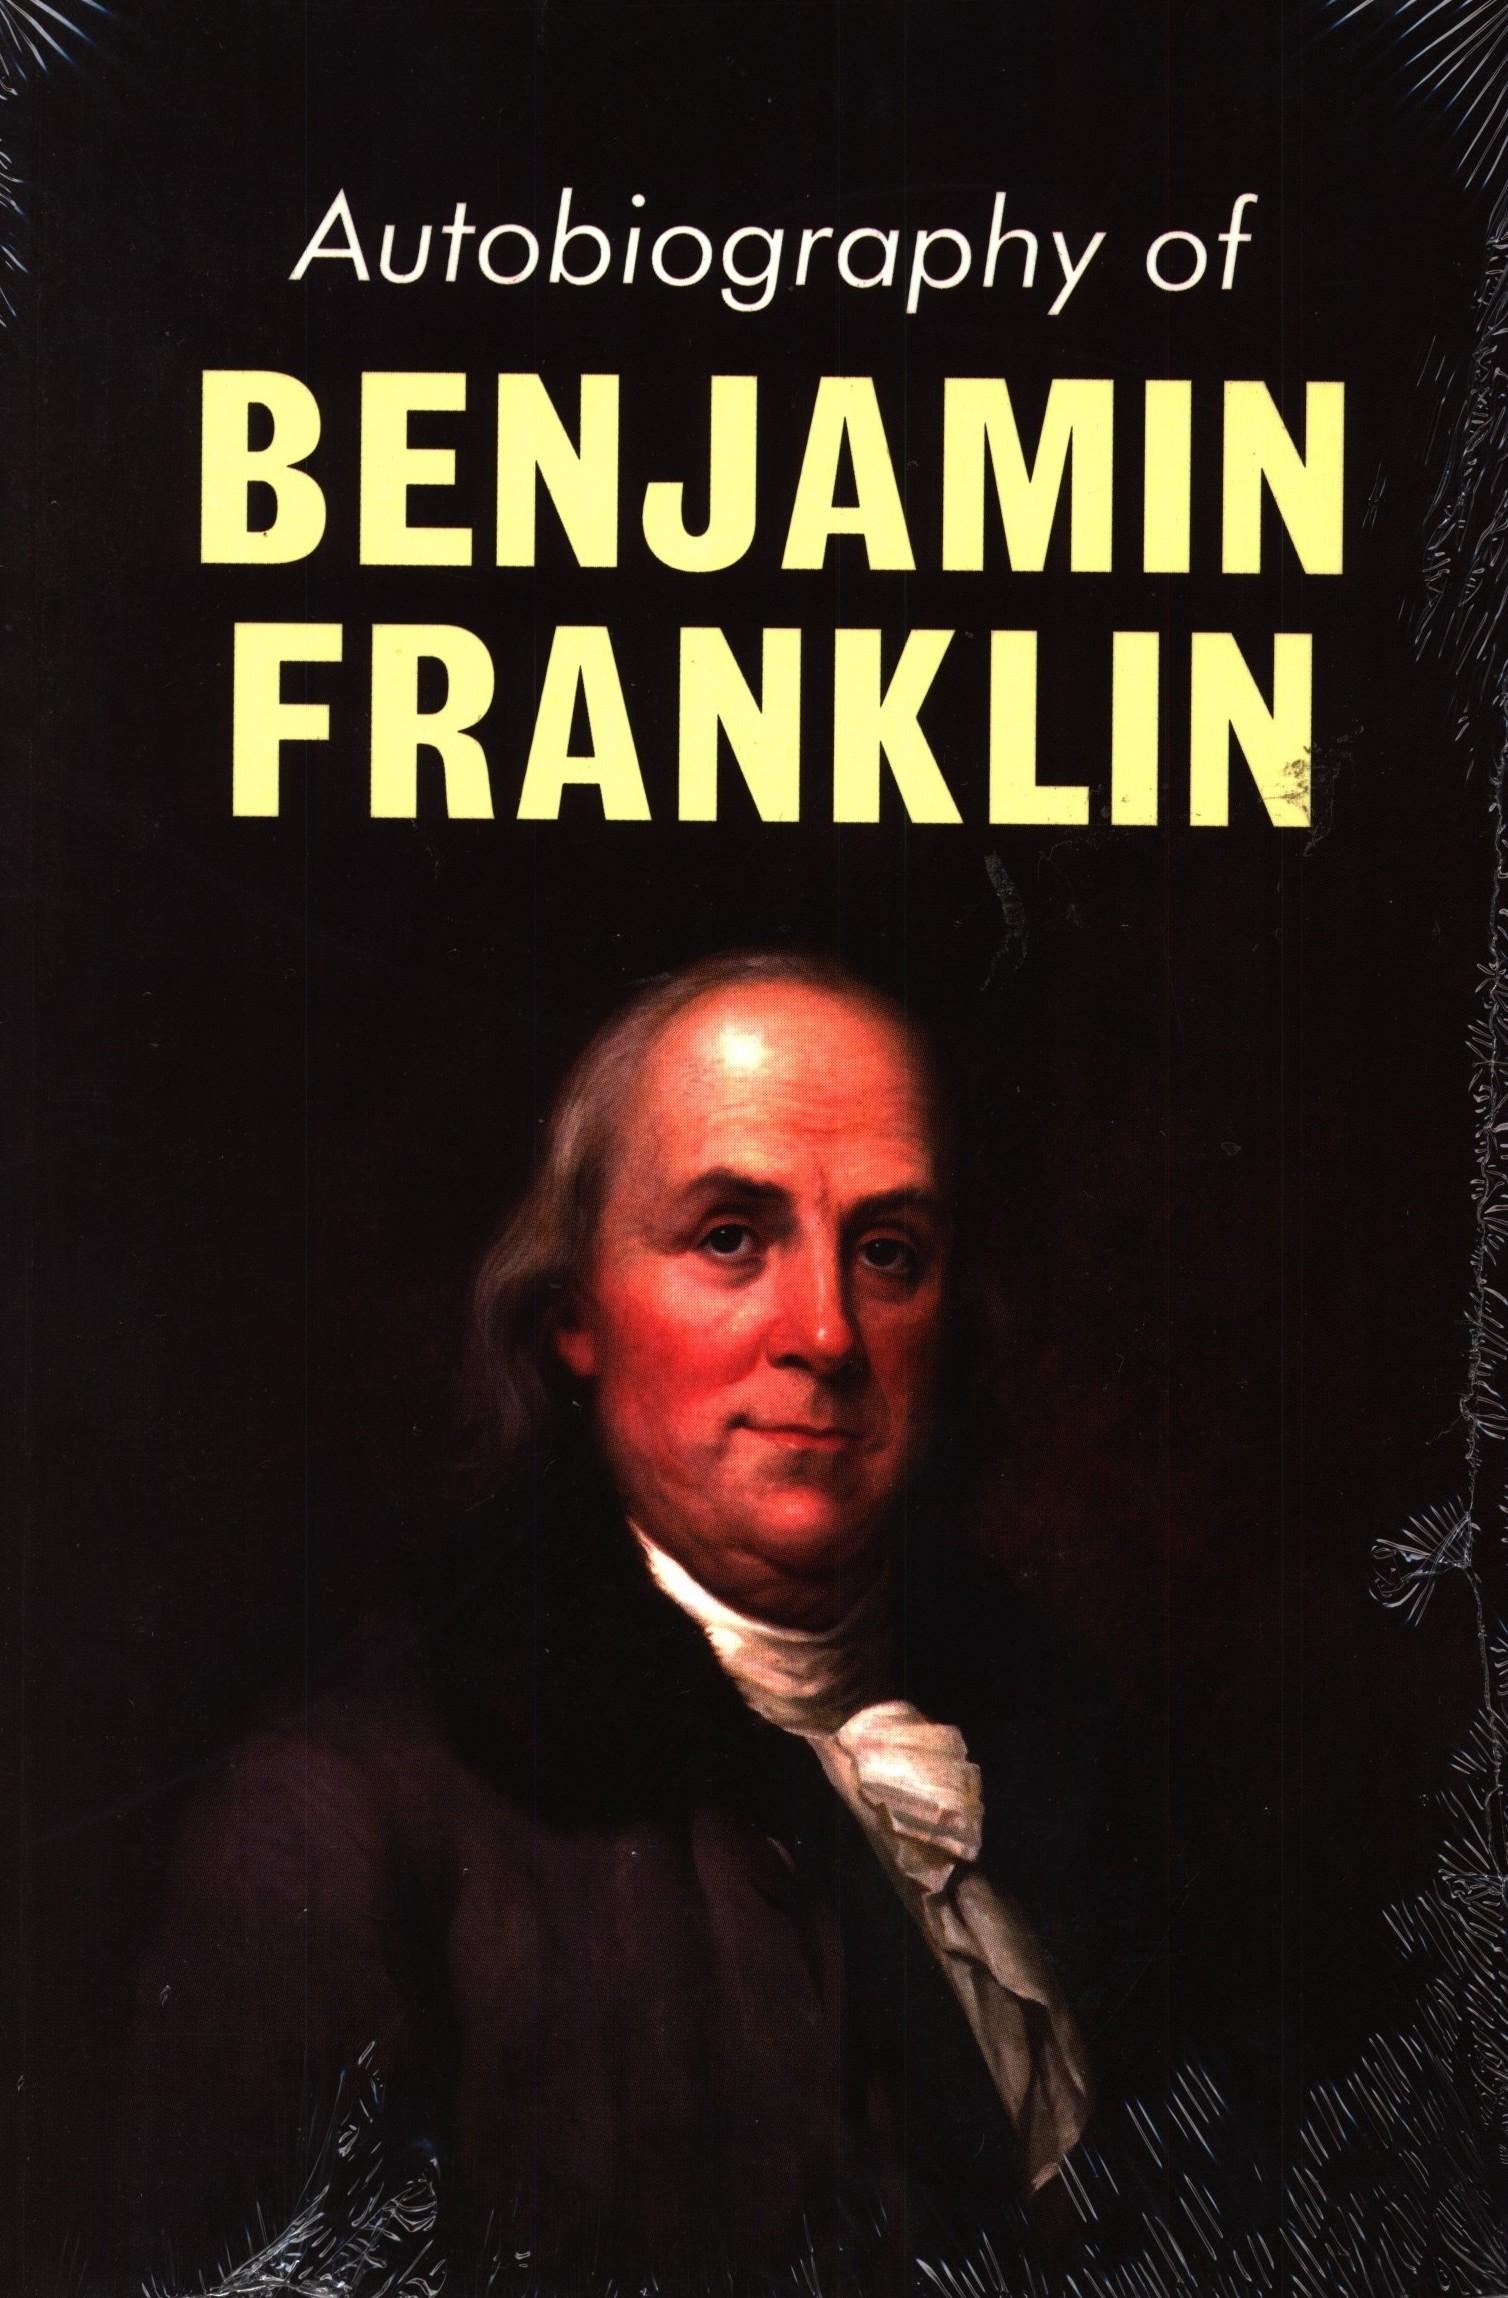 autobiography-of-benjamin-fanklin-original-imadwjcfrgzzm9gk.jpeg